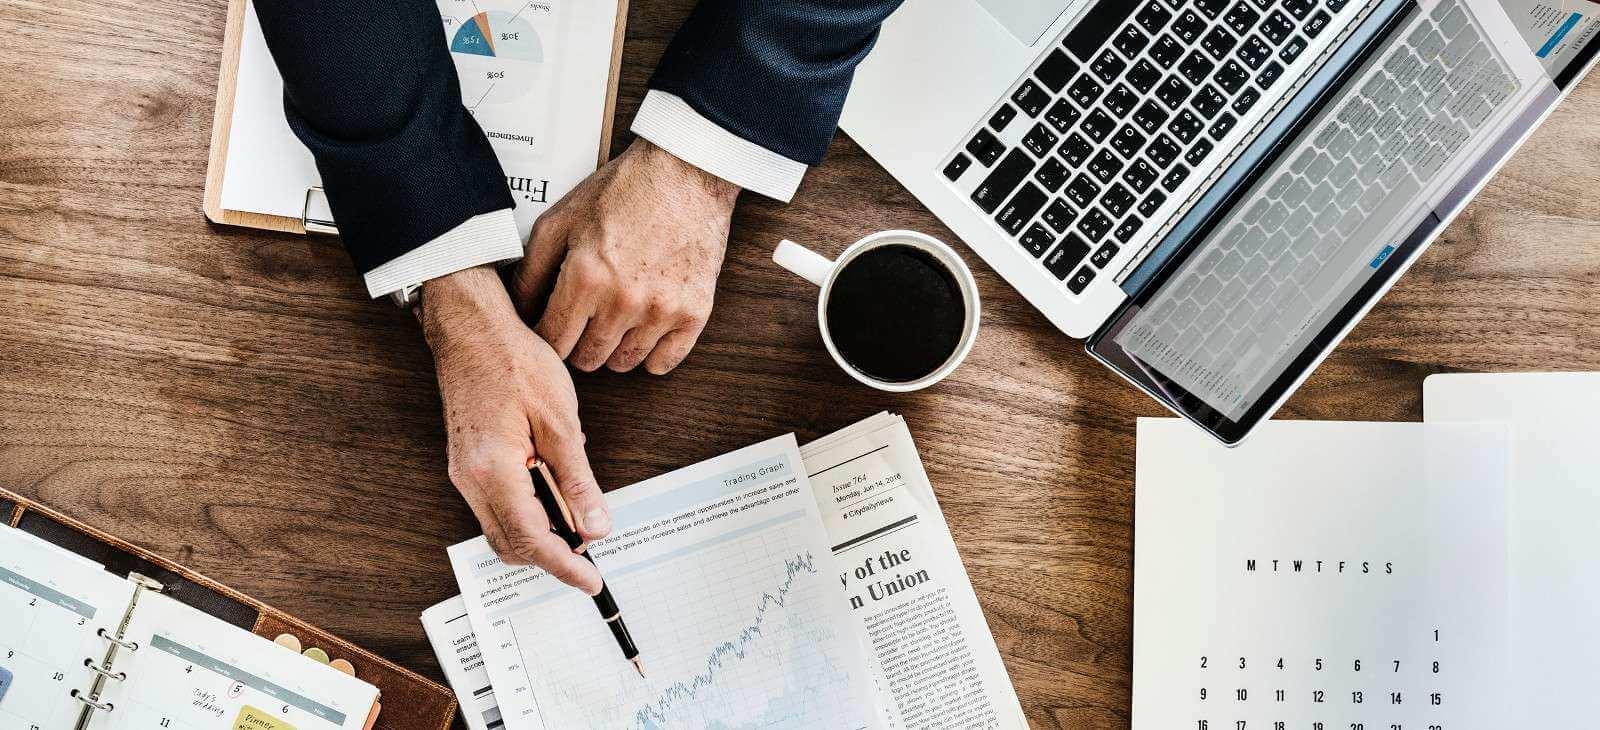 4 Skills που χρειάζεσαι για να εργαστείς σε μια εταιρία Digital Marketing🎇